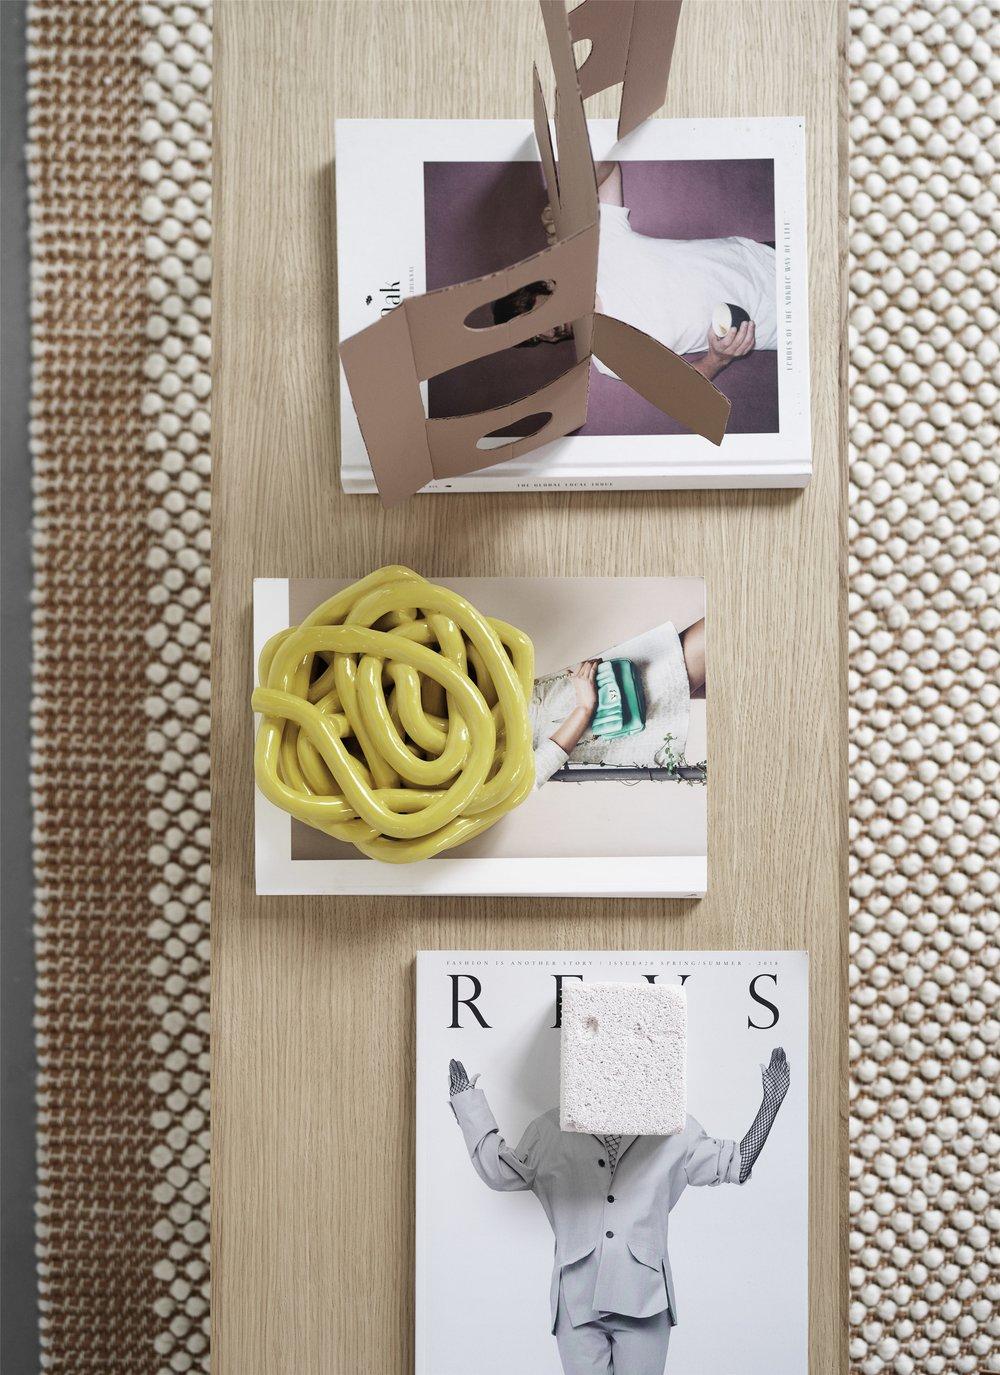 Pebble rug & workshop table  muuto, home decor, accessories, interiors, scandinavian design 1.jpg